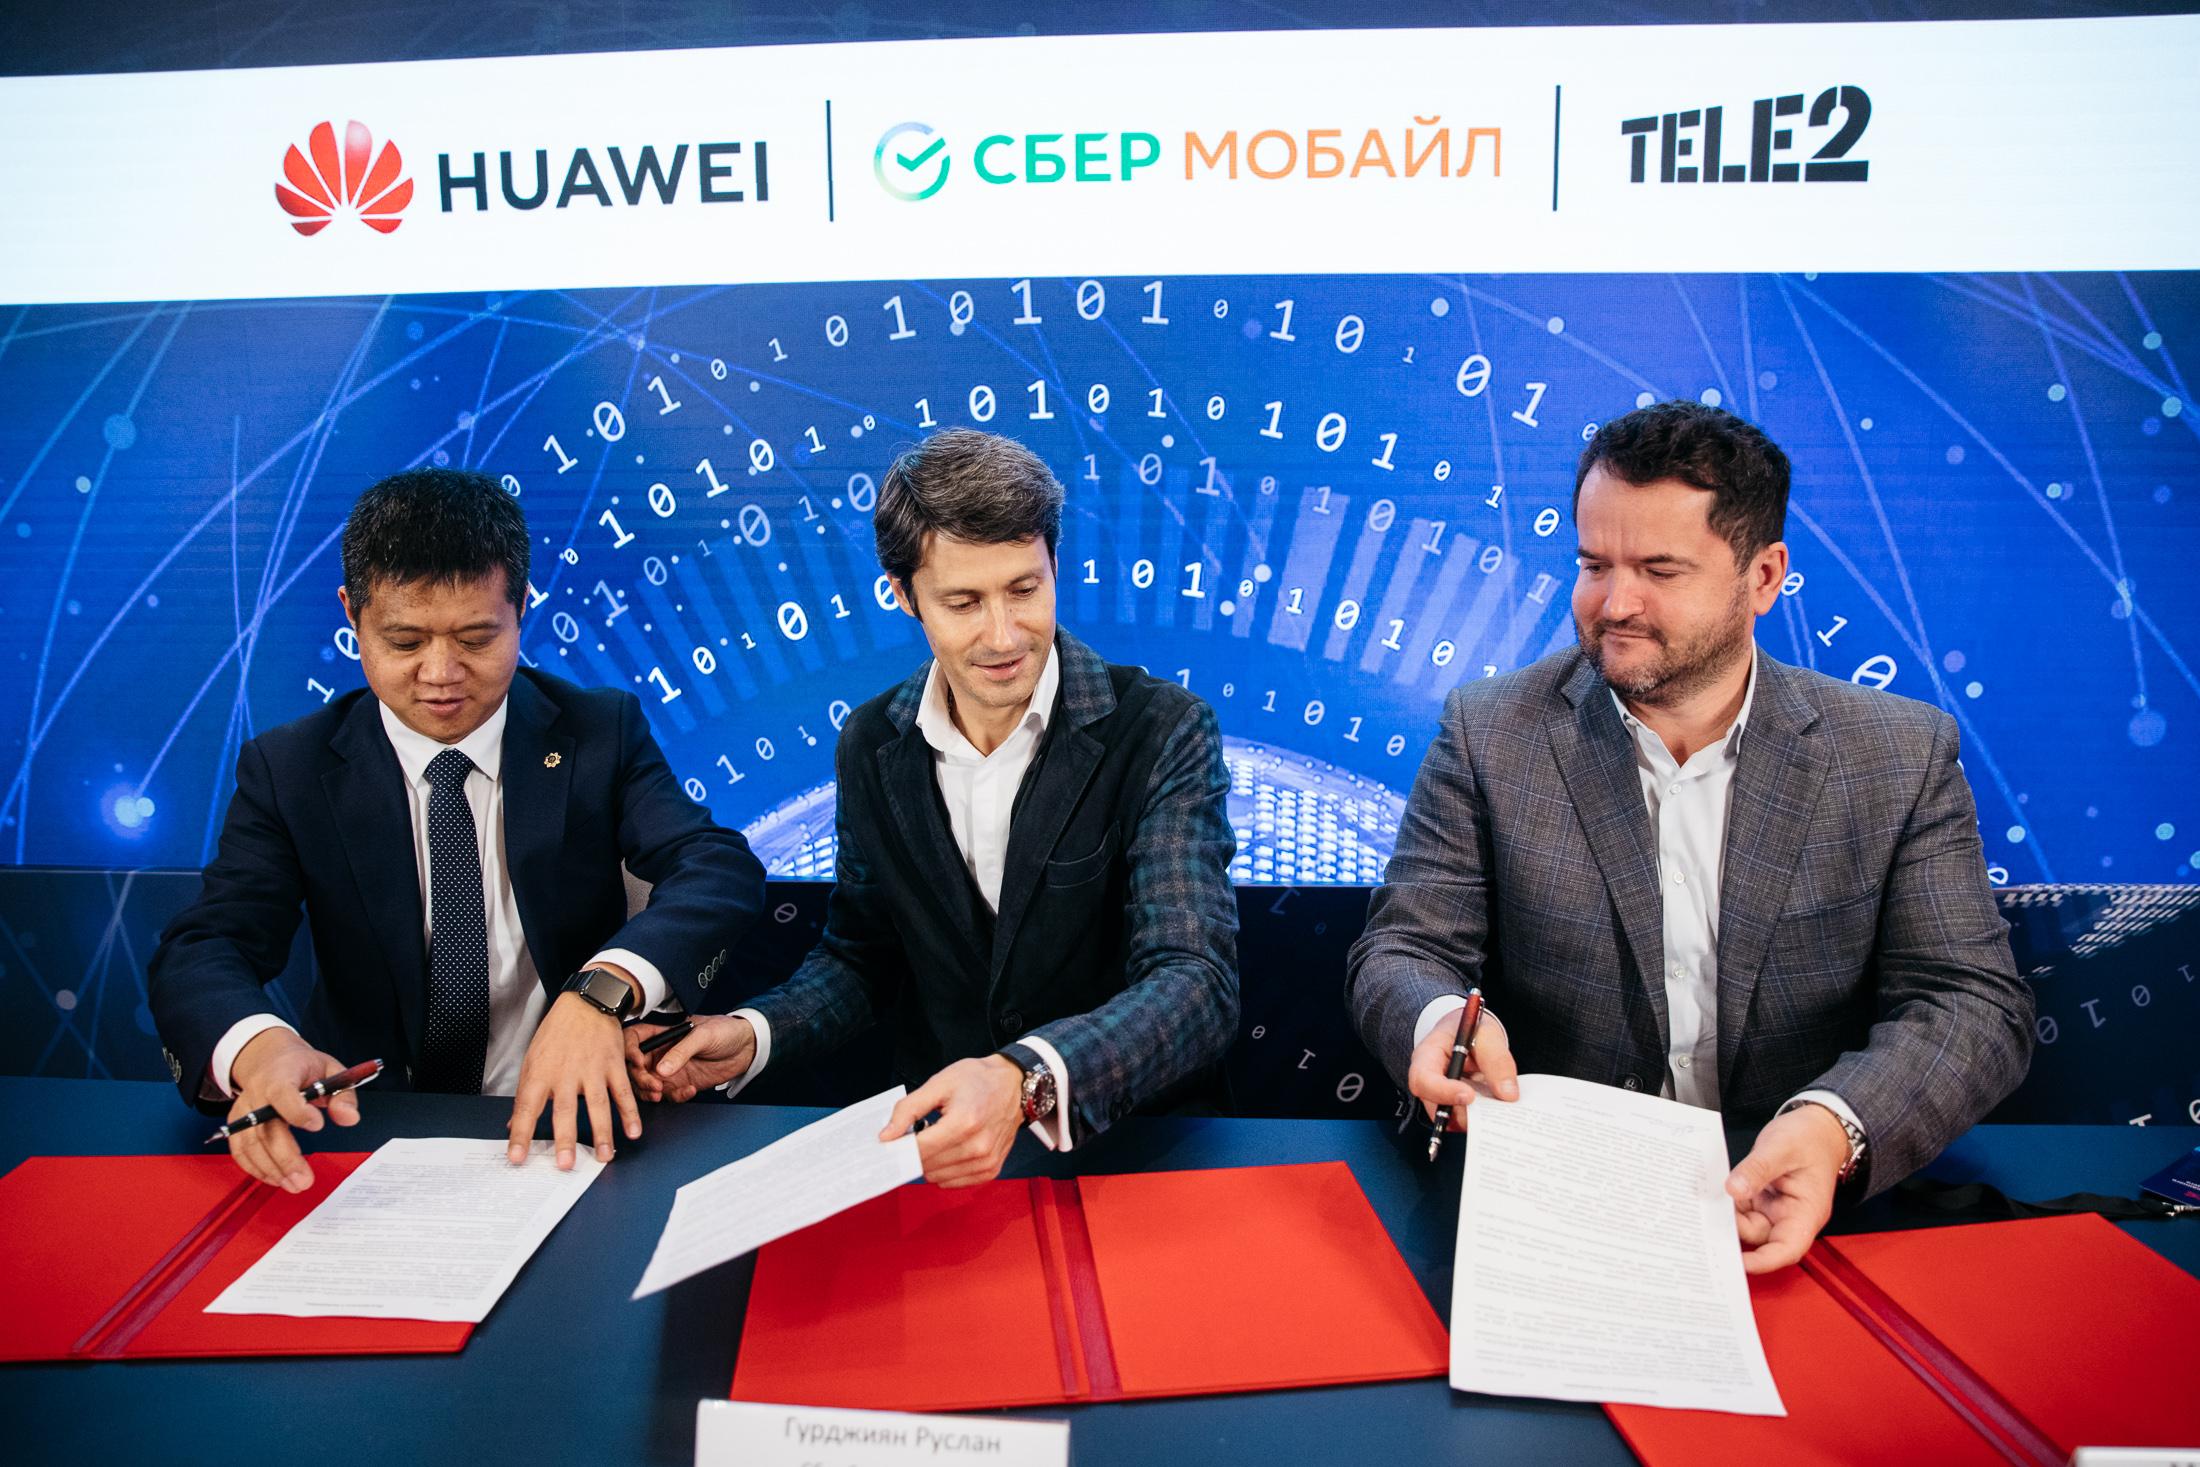 СберМобайл, Huawei и Tele2 протестируют технологии 5G 1